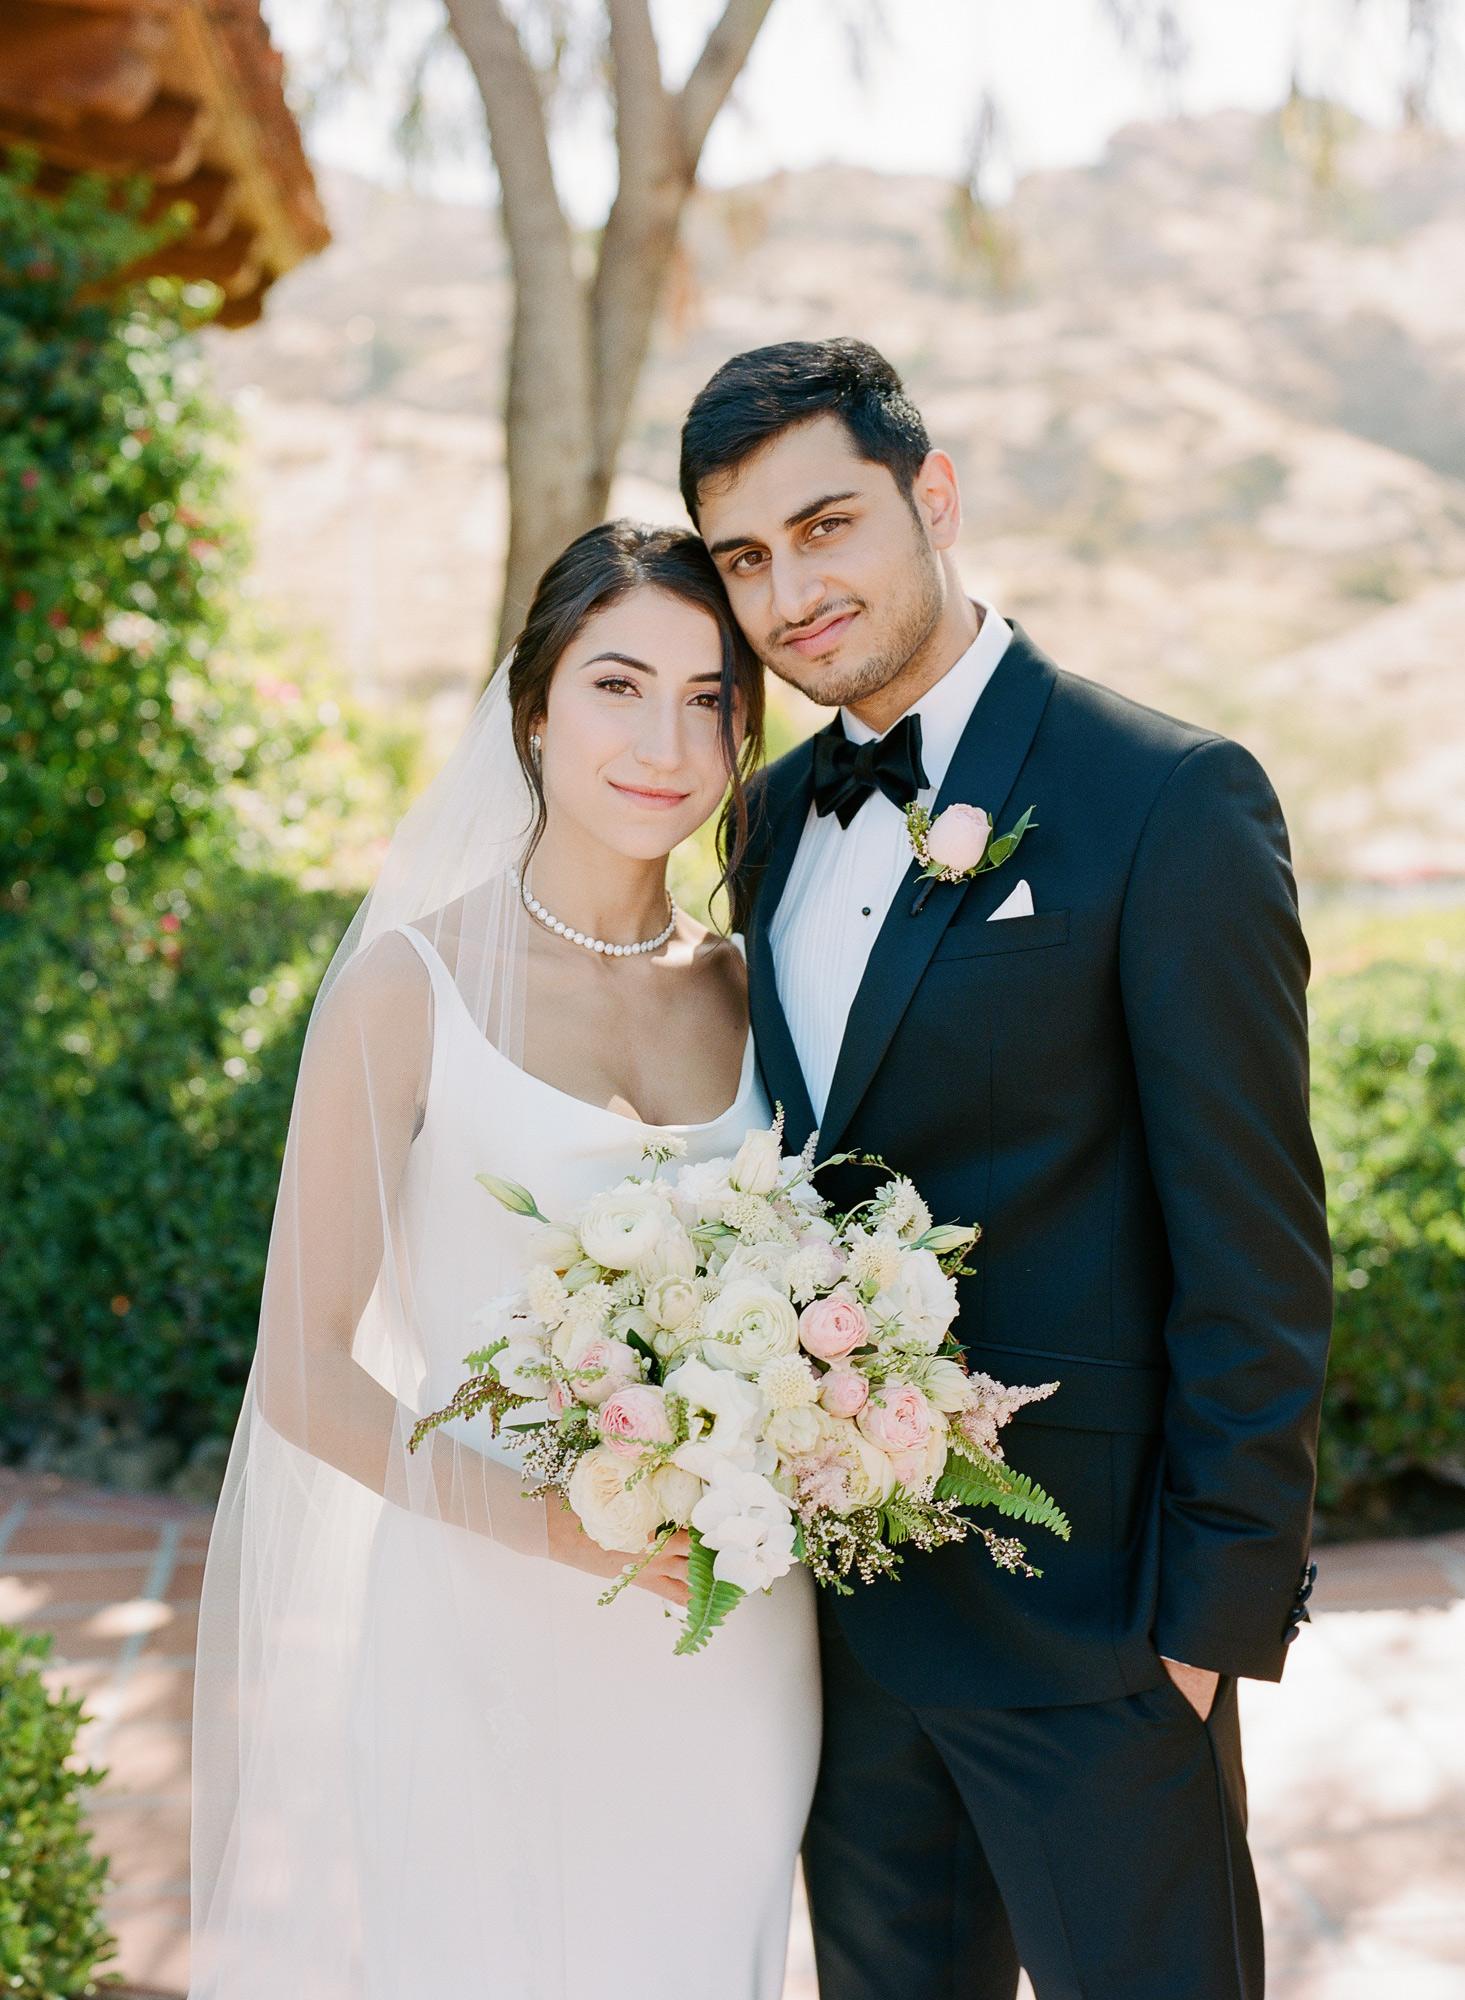 wedding couple bride holding bouquet